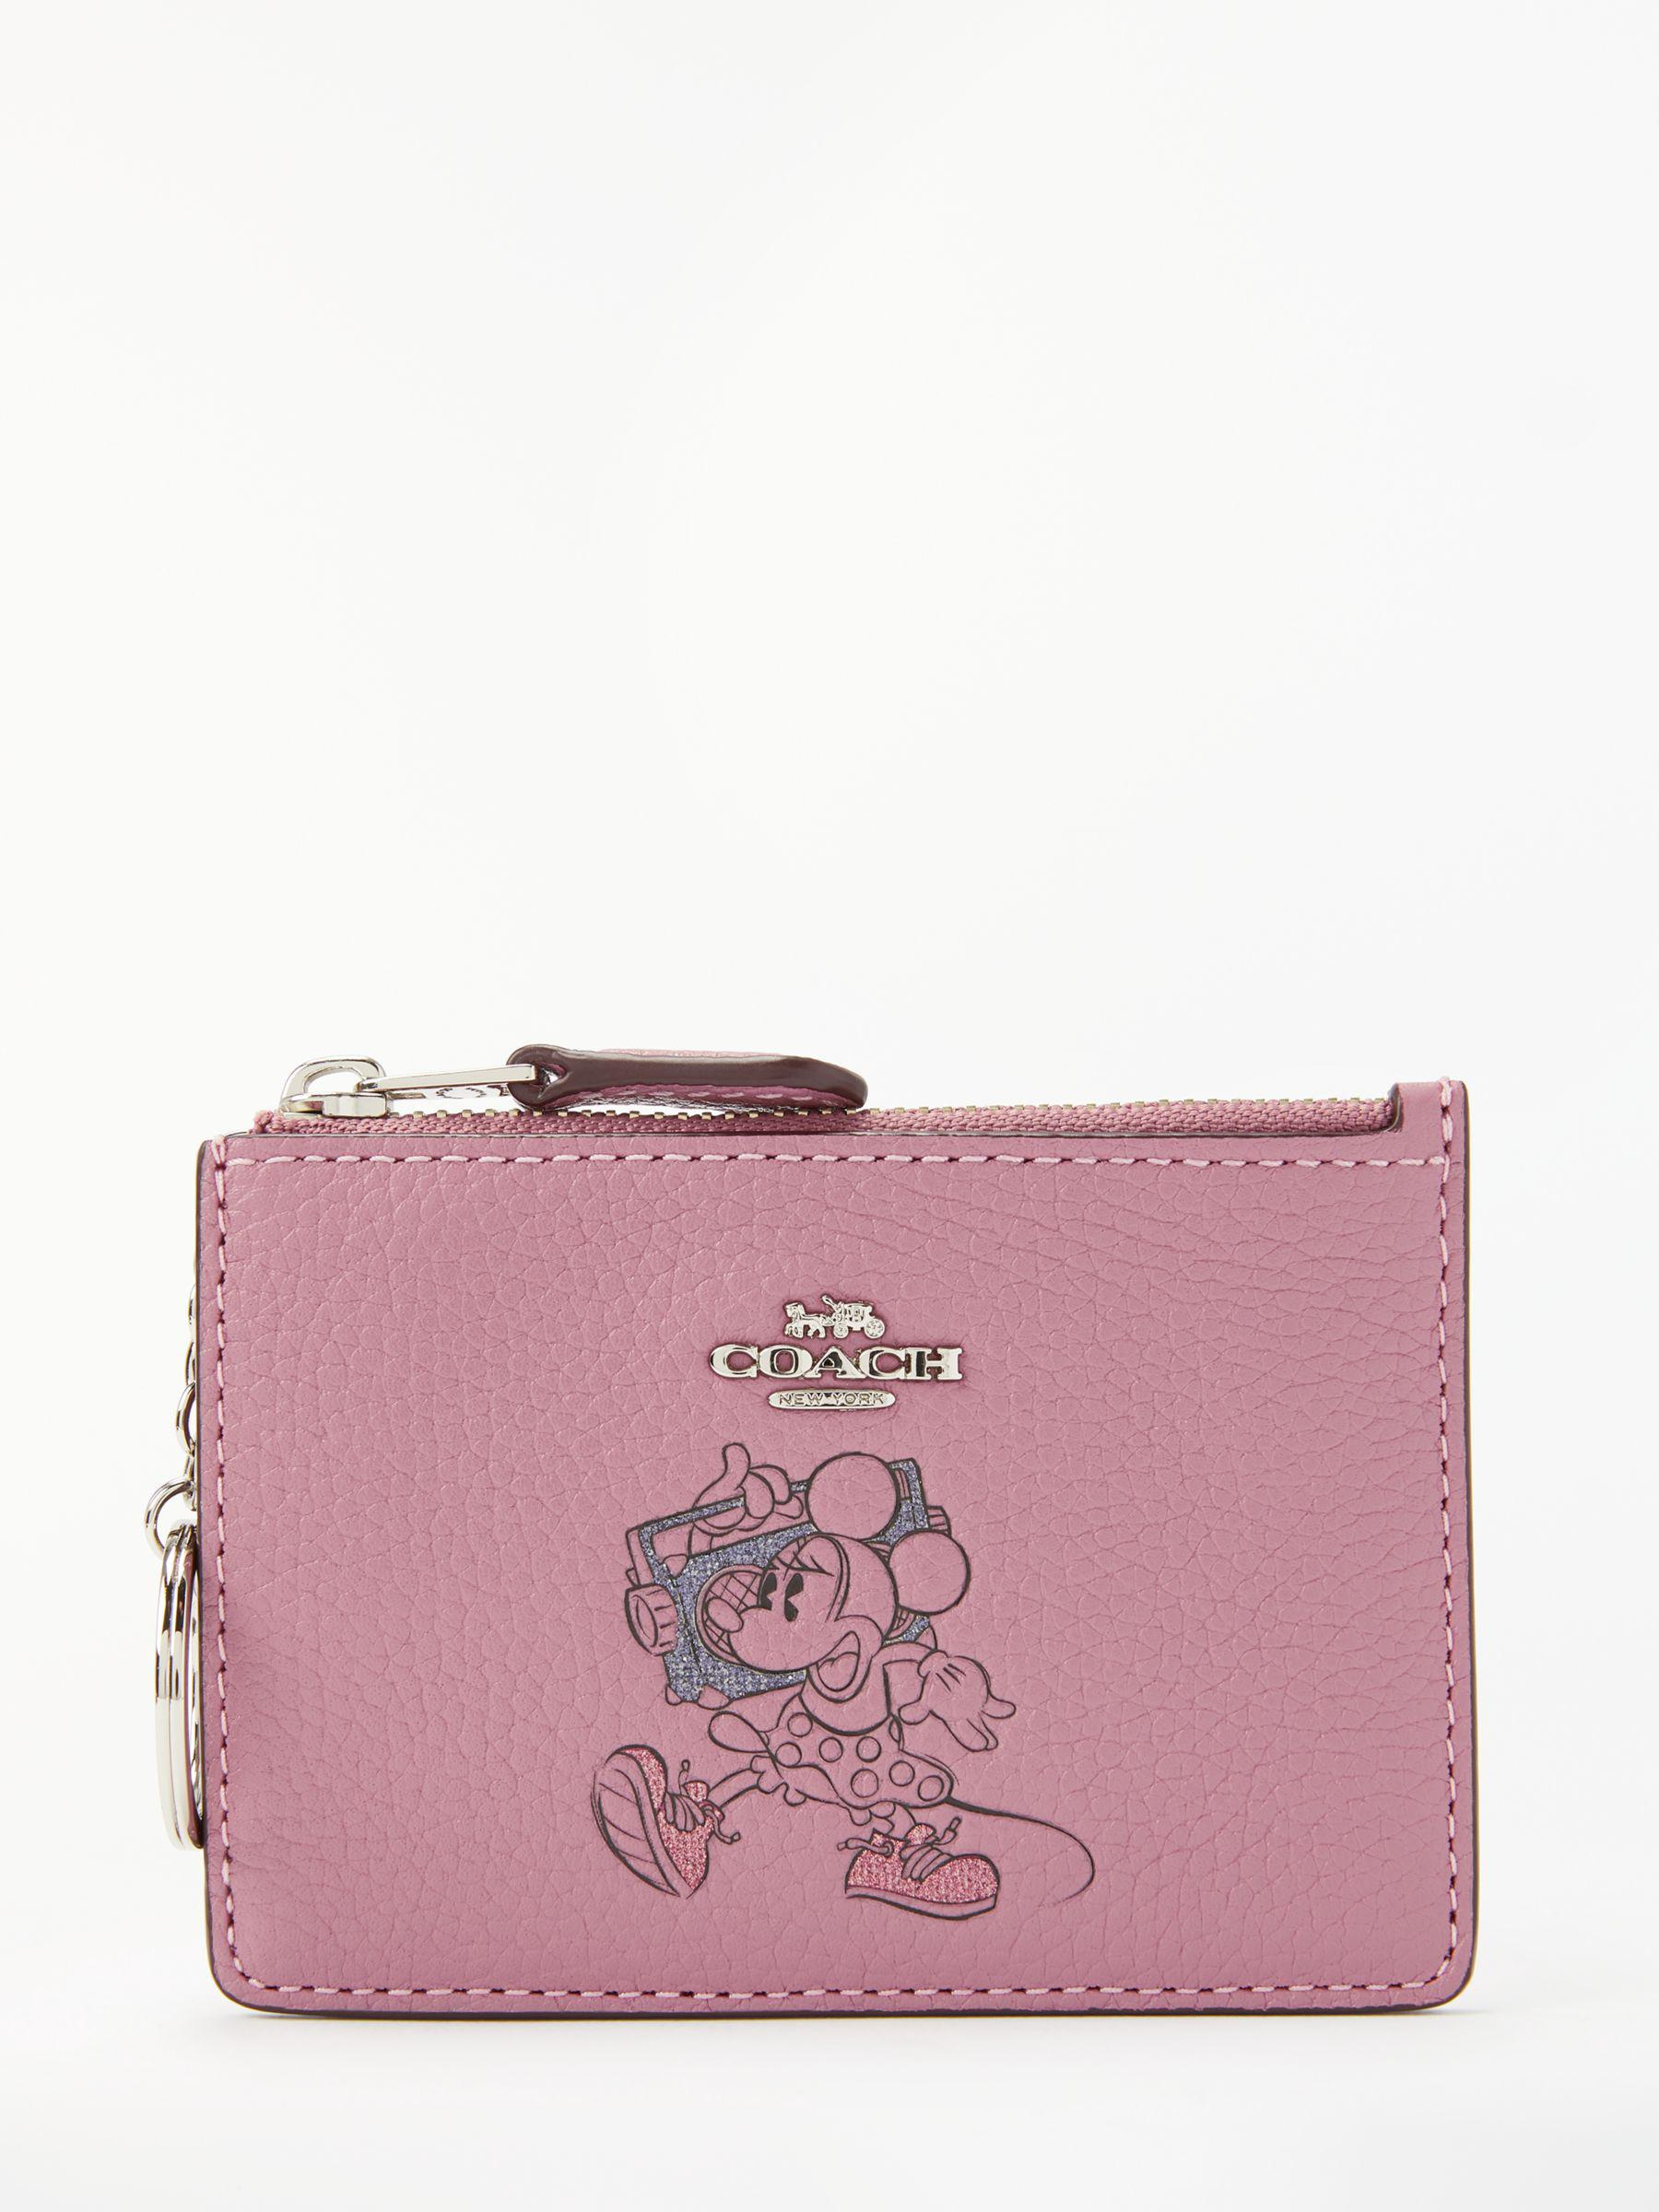 5396d6a8c86b COACH Disney X Minnie Leather Skinny Coin Purse in Pink - Lyst